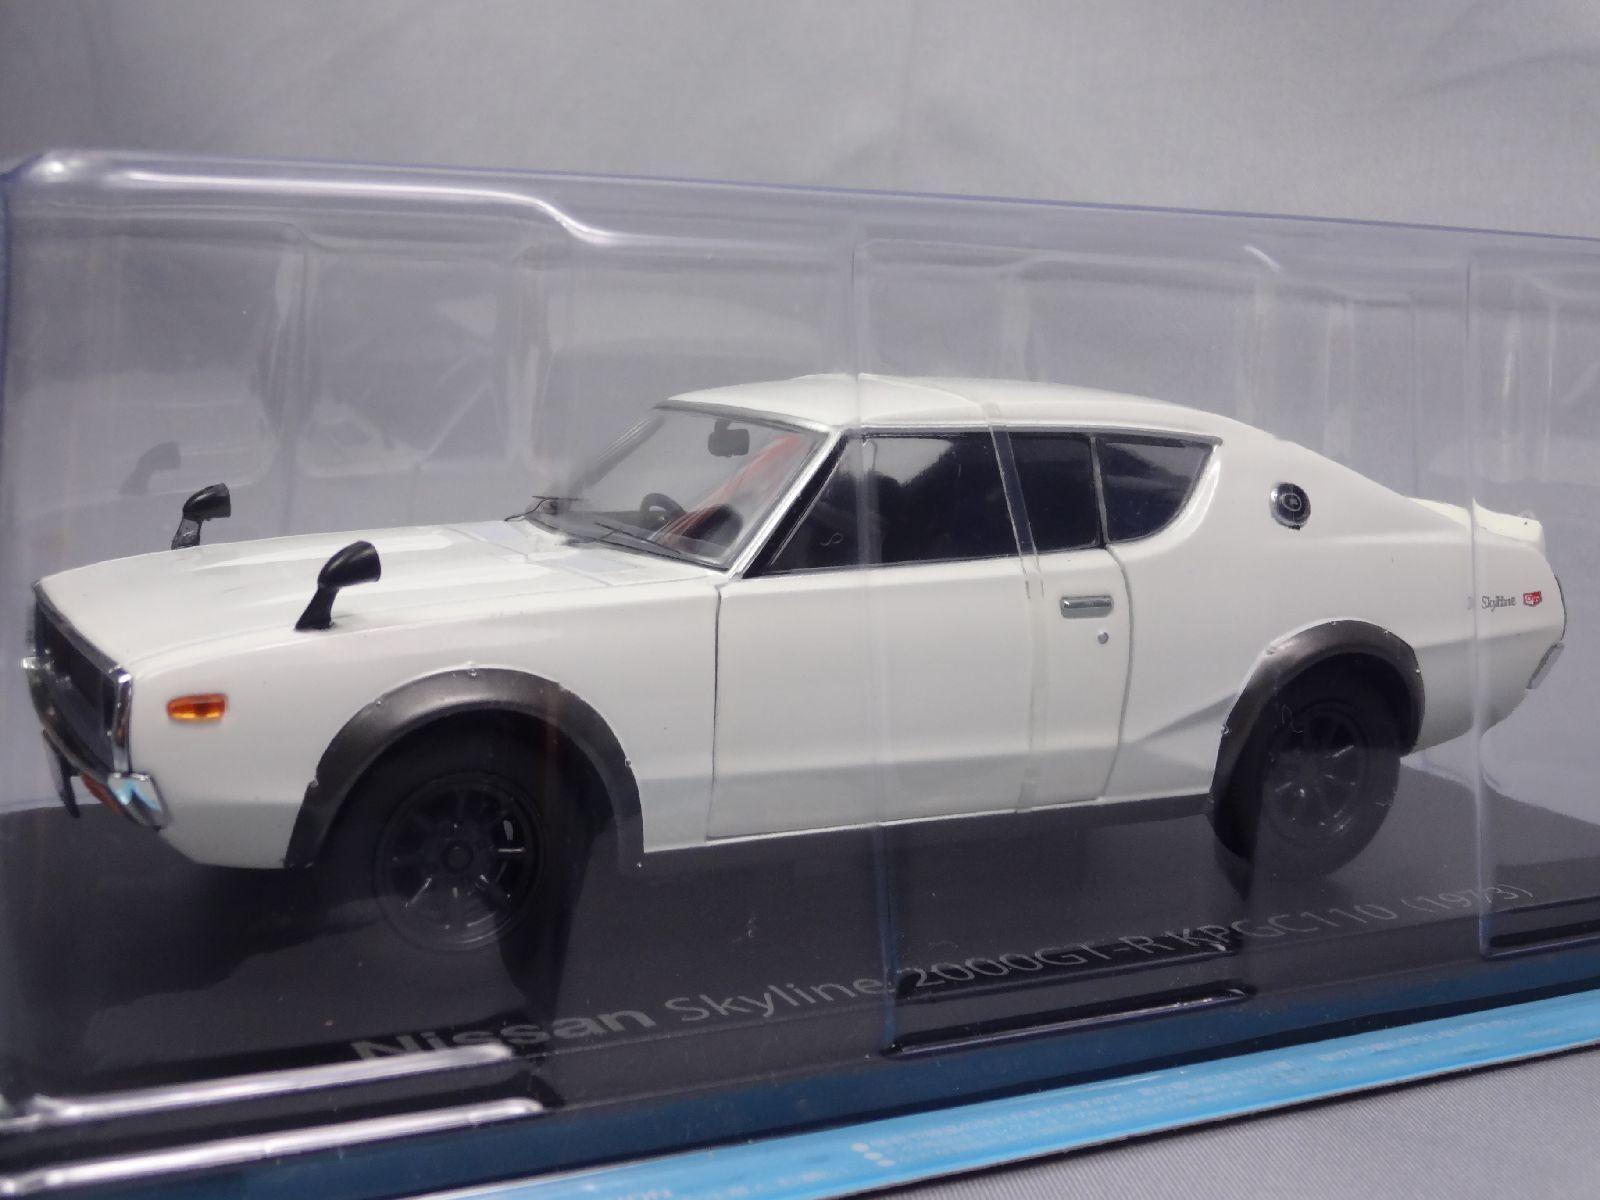 NISSAN SKYLINE KPGC110 2000GT 1973 1/24 Scale Box Car Display Diecast 3CA8